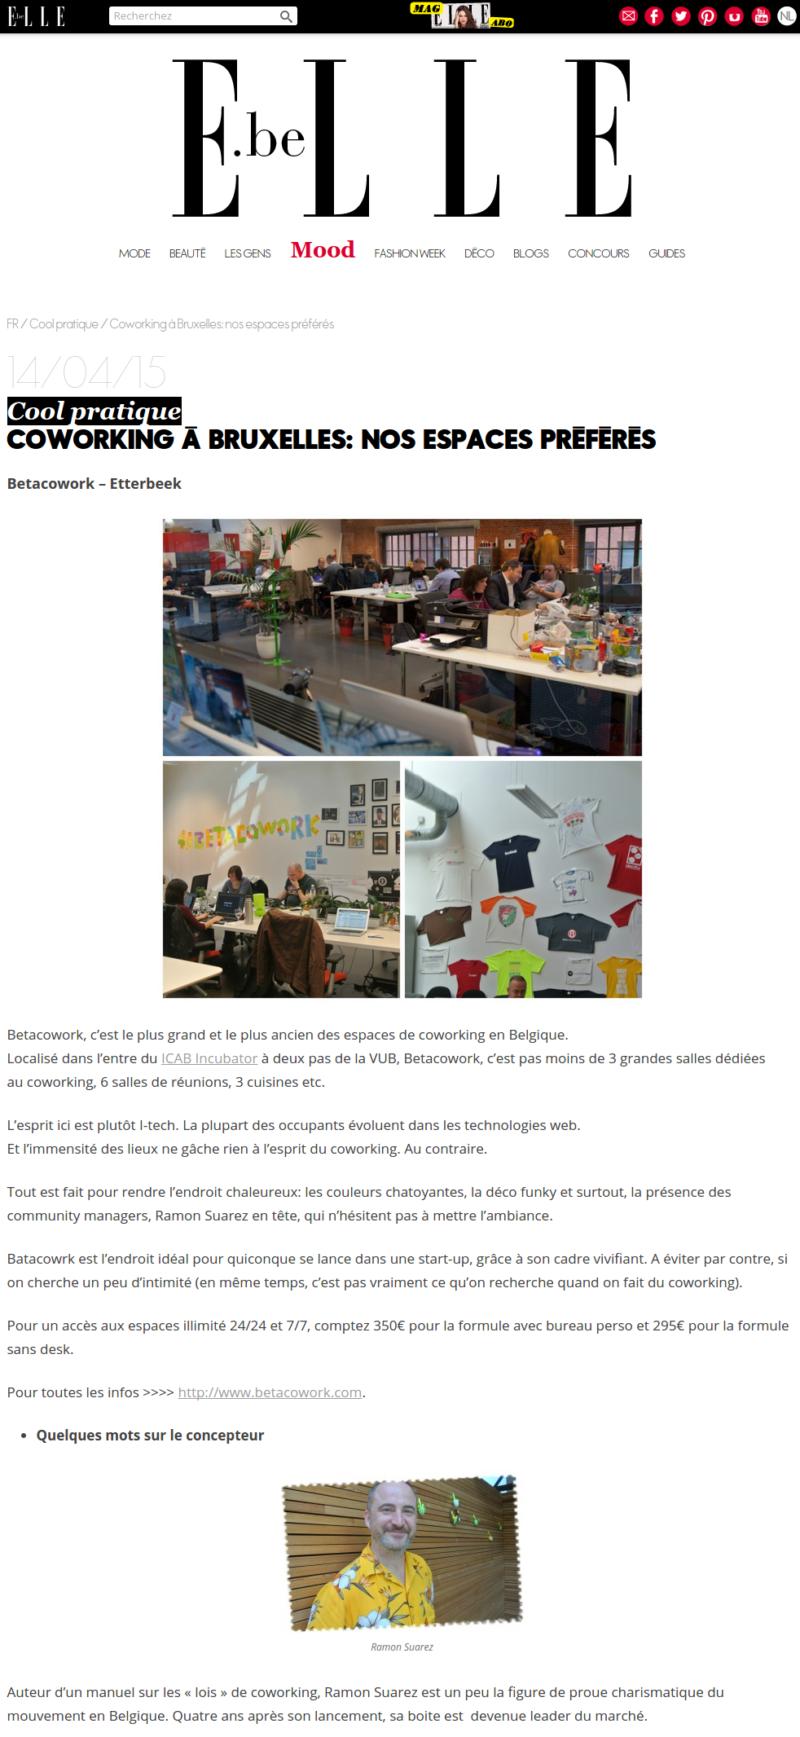 ellebelgique-coworking-favoris-bruxelles-betacowork-20150415